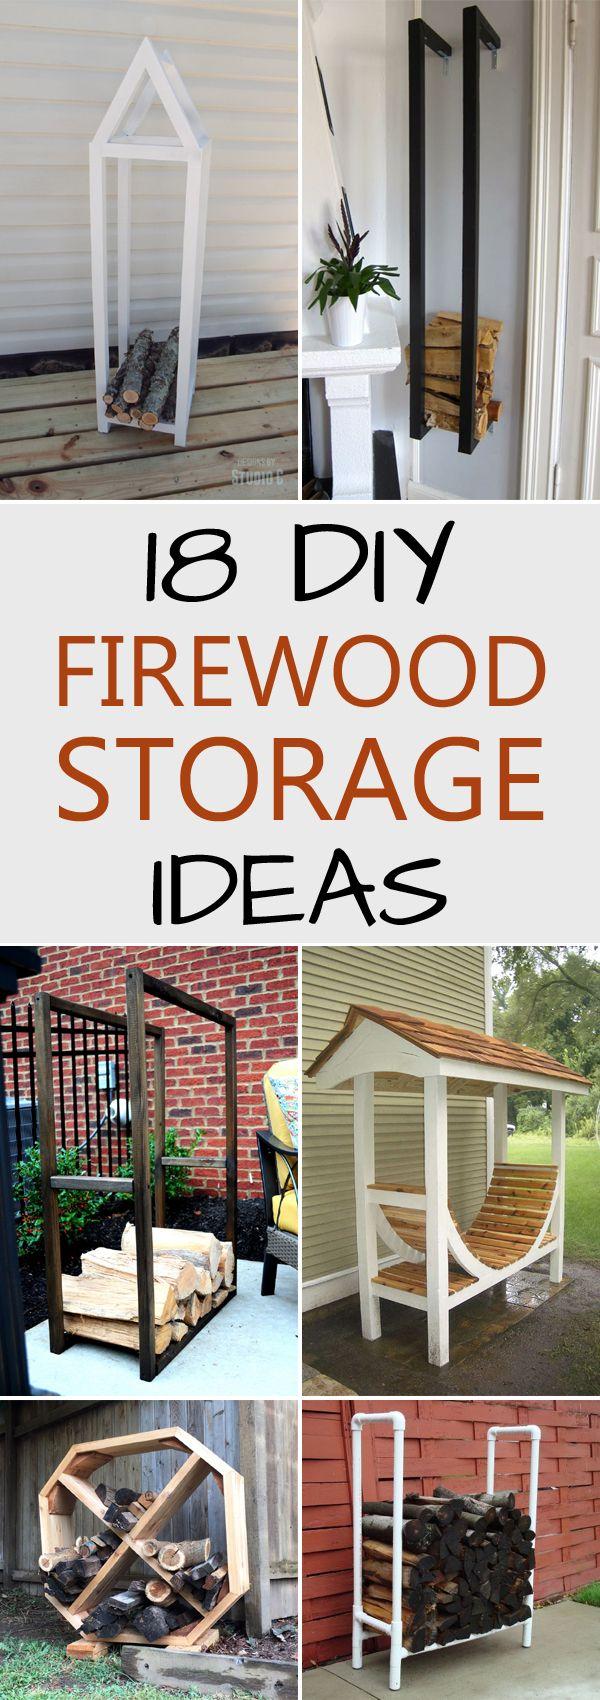 Best Rustic Firewood Racks Ideas On Pinterest Heat Logs - Creative firewood storage ideas turning wood beautiful yard decorations